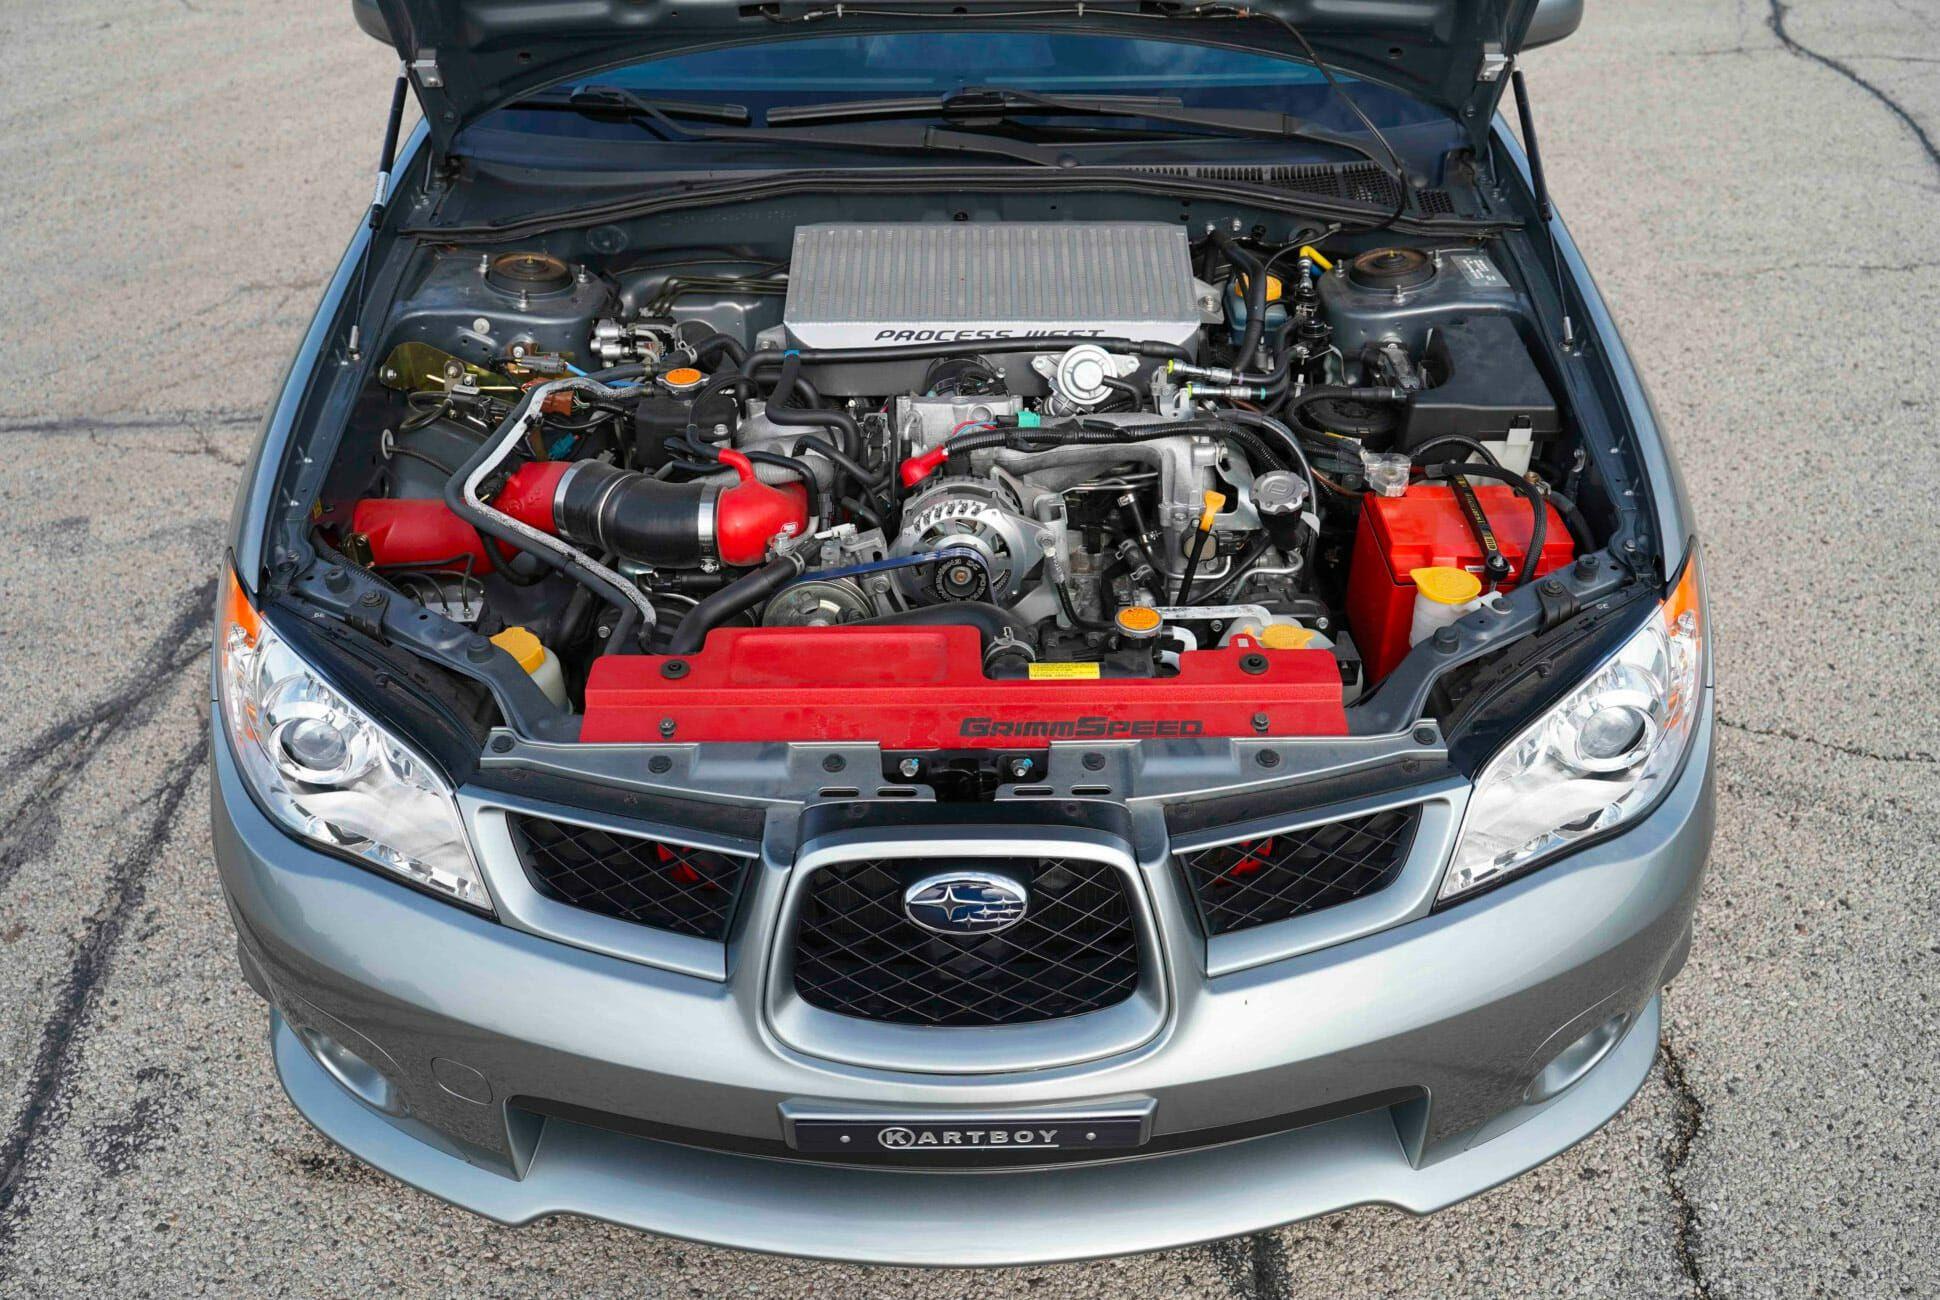 2007-Subaru-WRX-Wagon-14K-Miles-gear-patrol-slide-12